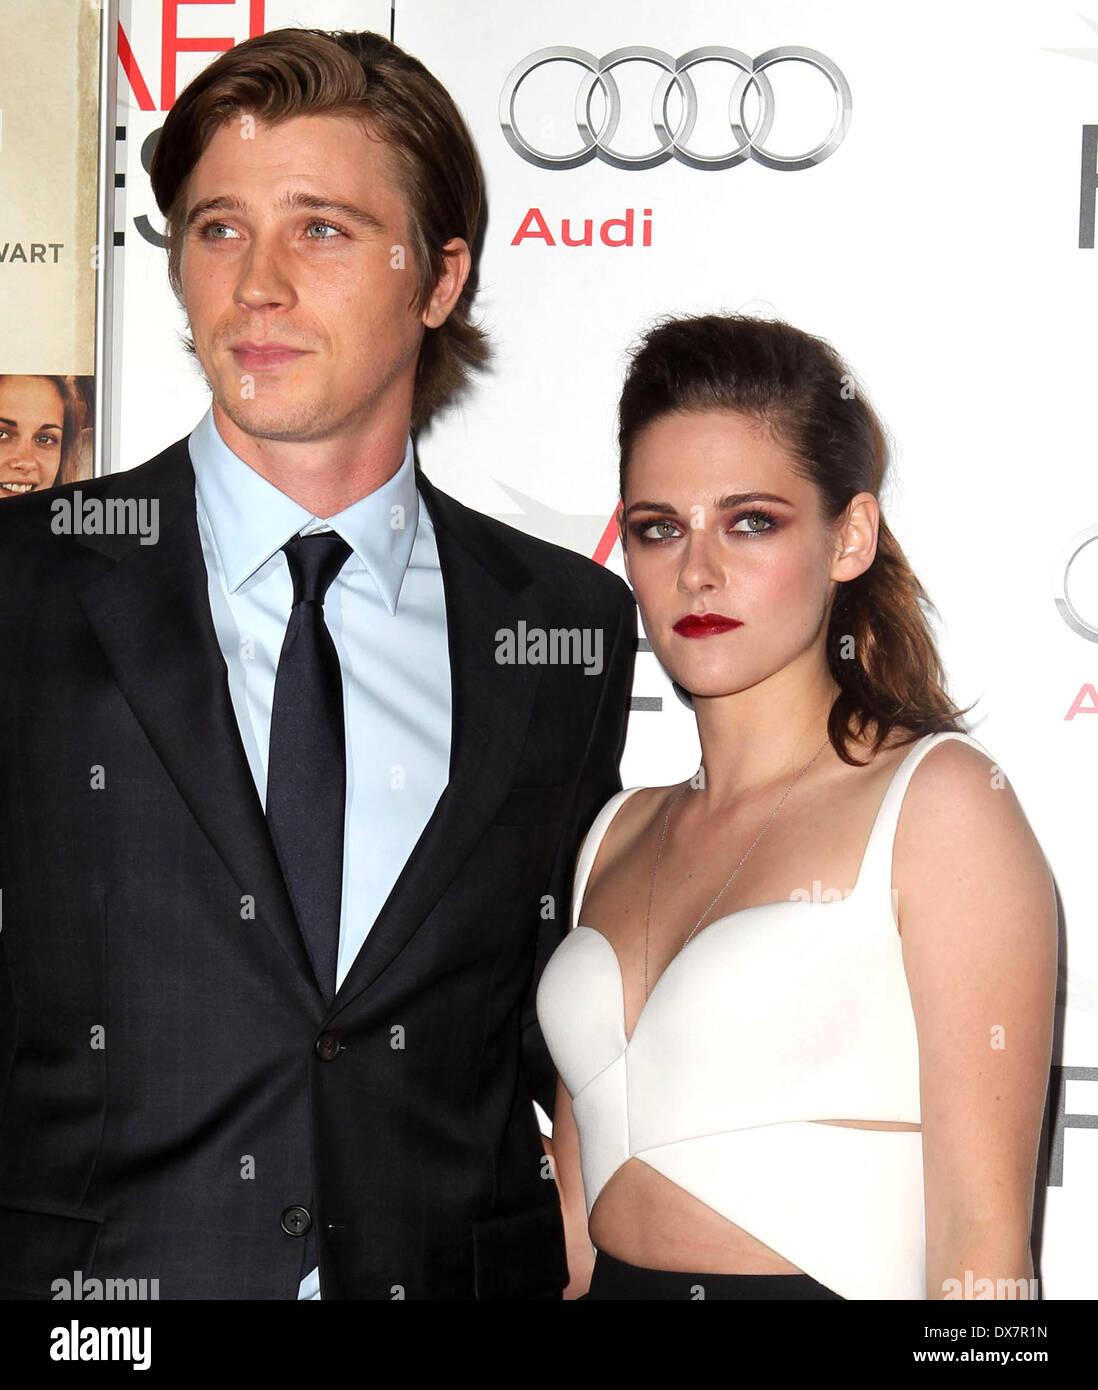 4ceb36c61cb67 Garrett Hedlund and Kristen Stewart AFI Fest - 'On The Road' - Centerpiece  Gala Screening - Arrivals Los Angeles, California - 03.11.12 Featuring:  Garrett ...